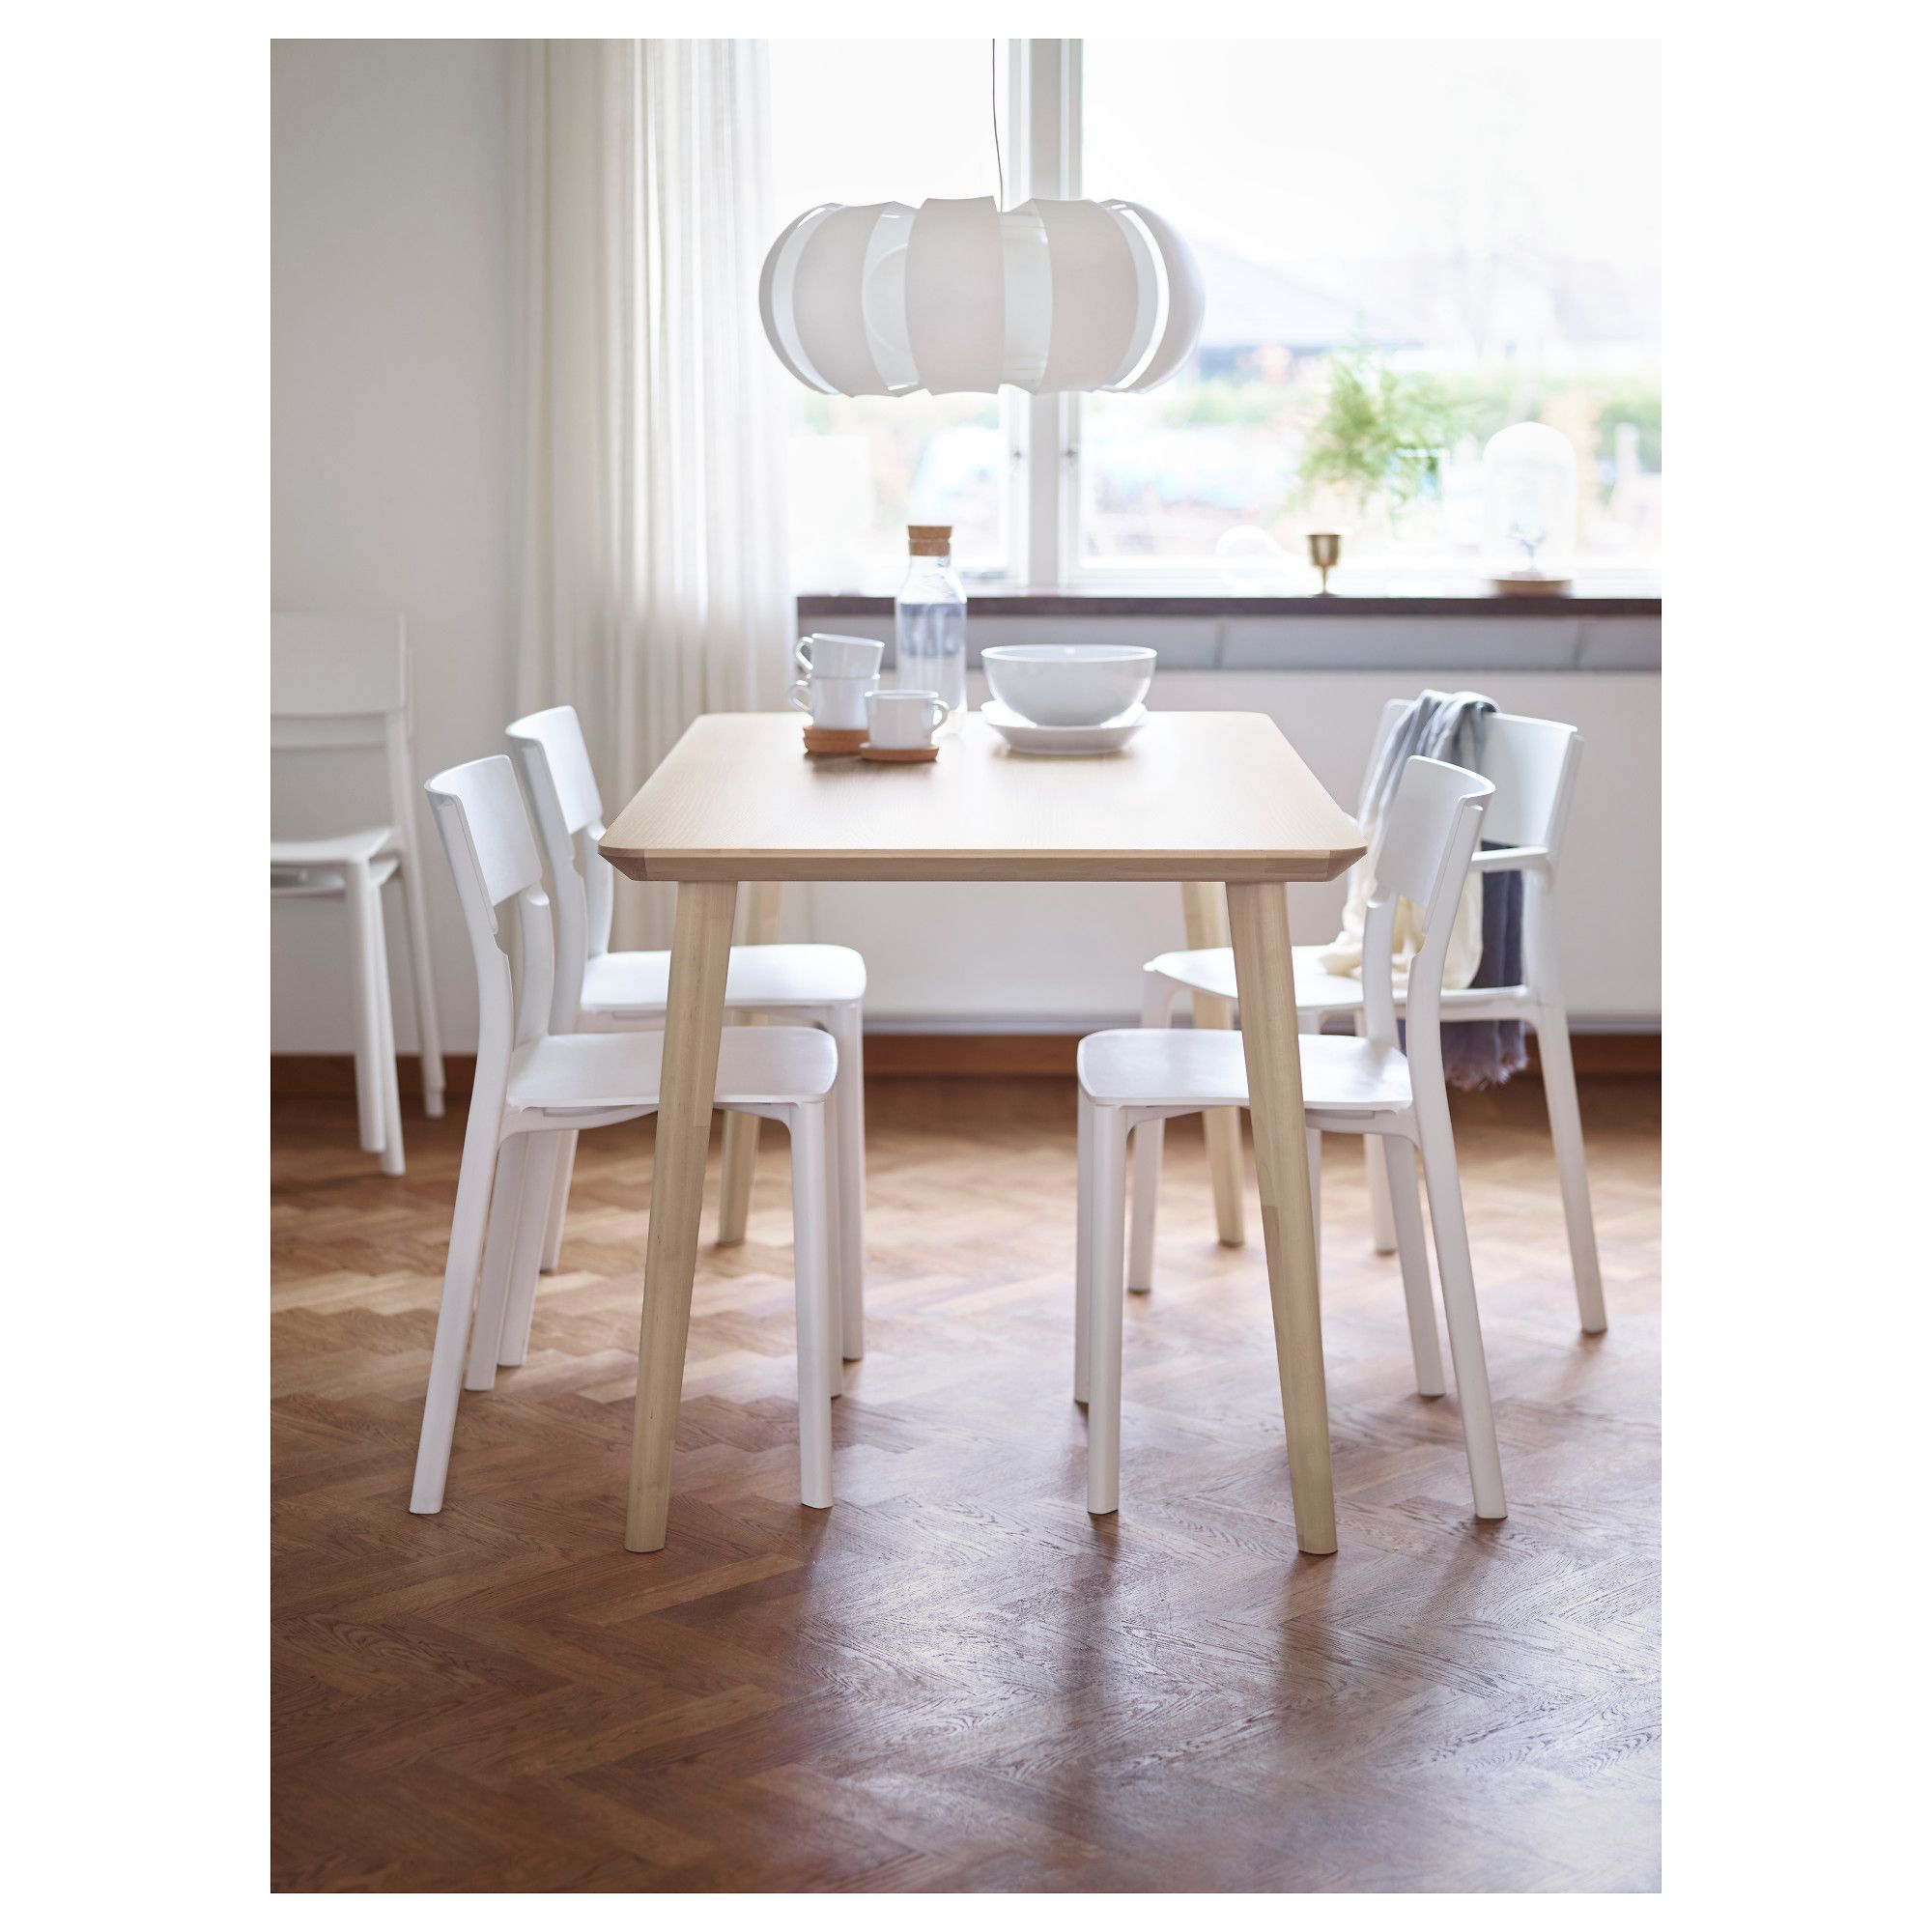 Magnificent Ikea Lisabo Table Ash Veneer Ikea Table Simple Download Free Architecture Designs Rallybritishbridgeorg